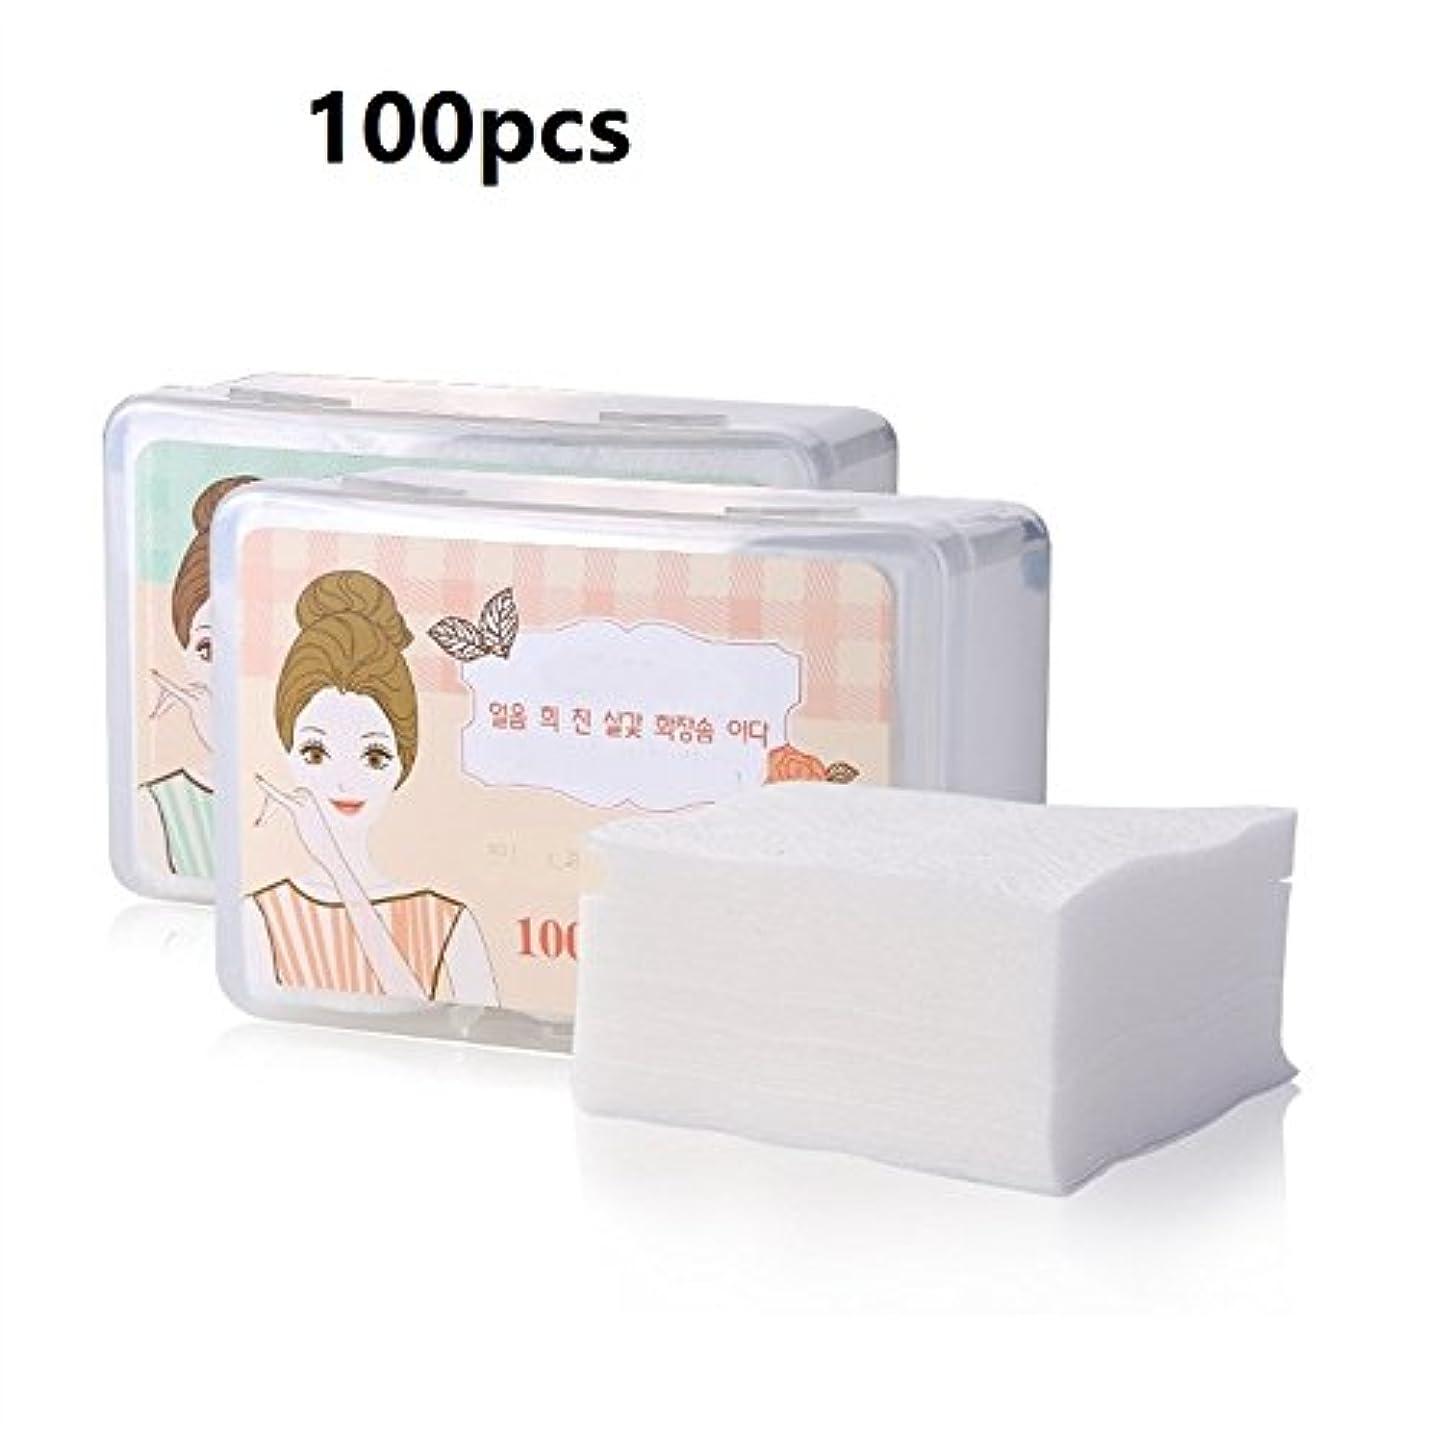 Aorunji 柔らかい ソフトコスメティックコットンパッド高品質のネイルワイプフェイシャルメイクリムーバクリーニングコットン(Appr.100pcs)